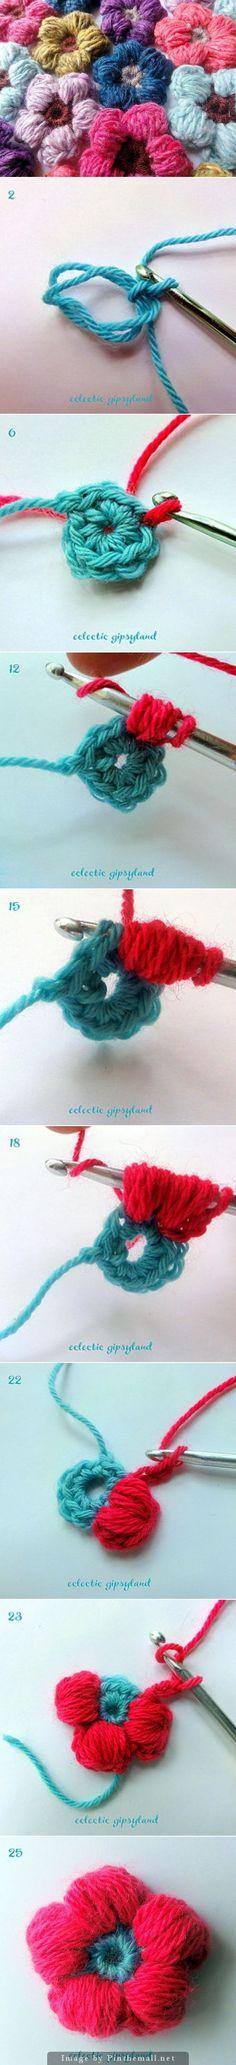 Puffy Flower Crochet Tutorial | GypsyBar: Excellent crochet tutorial for making…